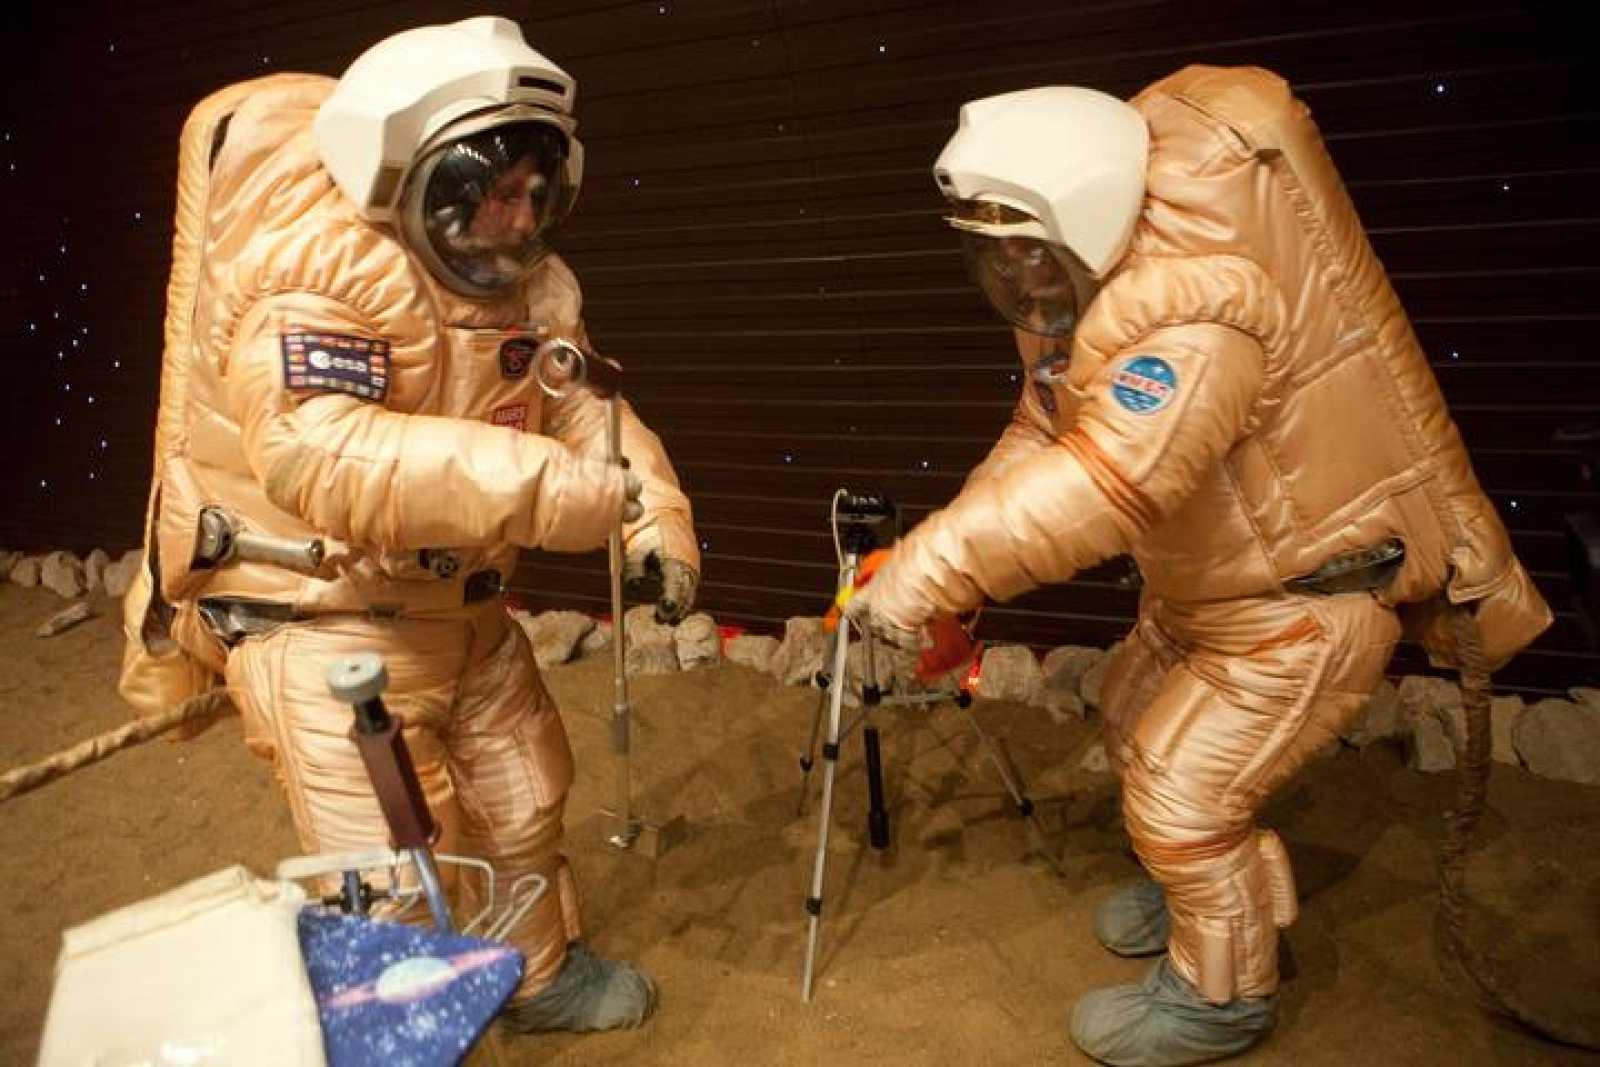 Astronautas agricultores para viajar a Marte